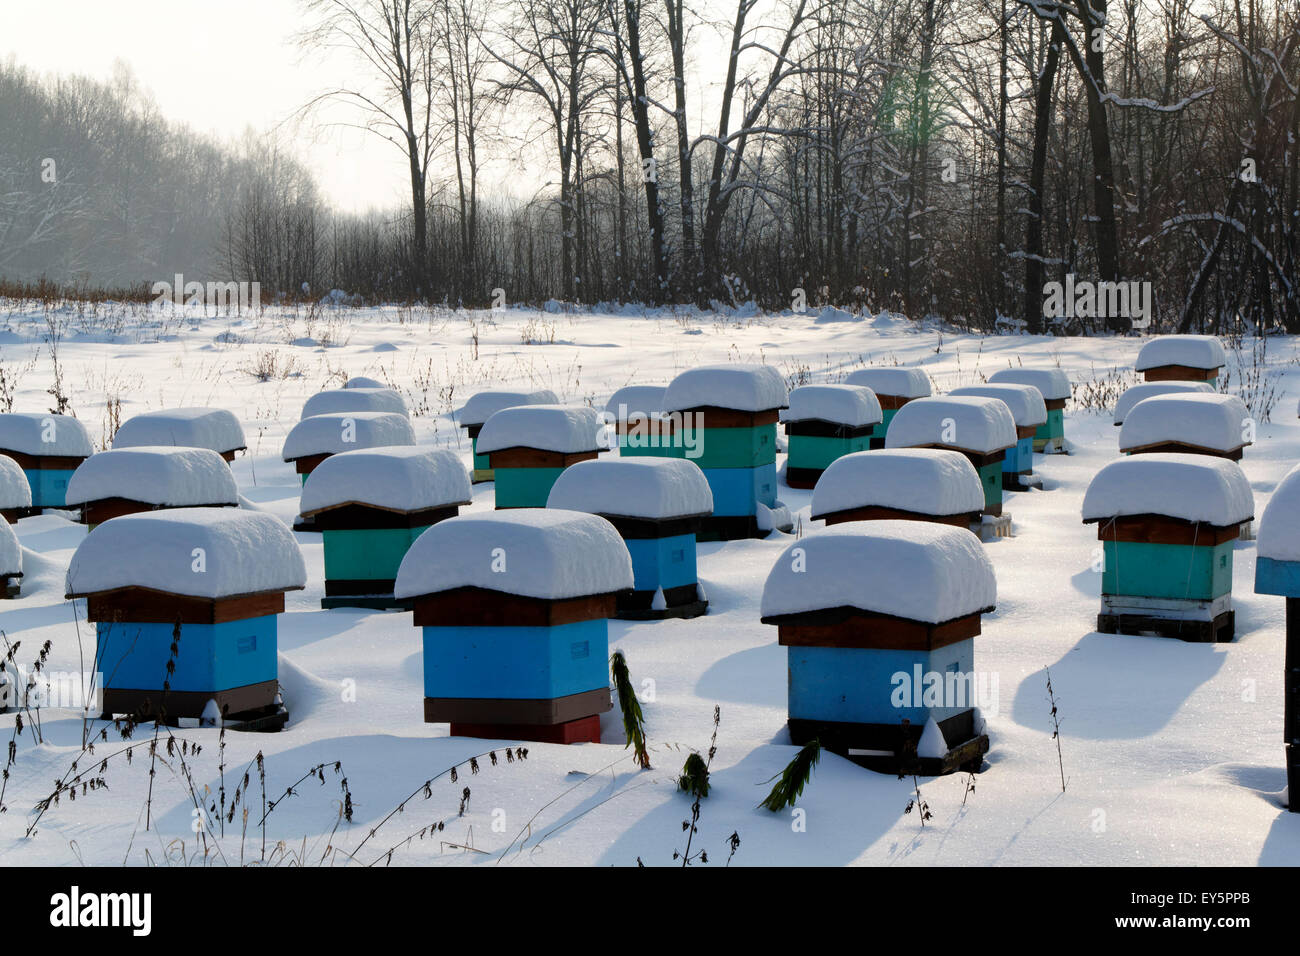 Hives at Winter - Stock Image